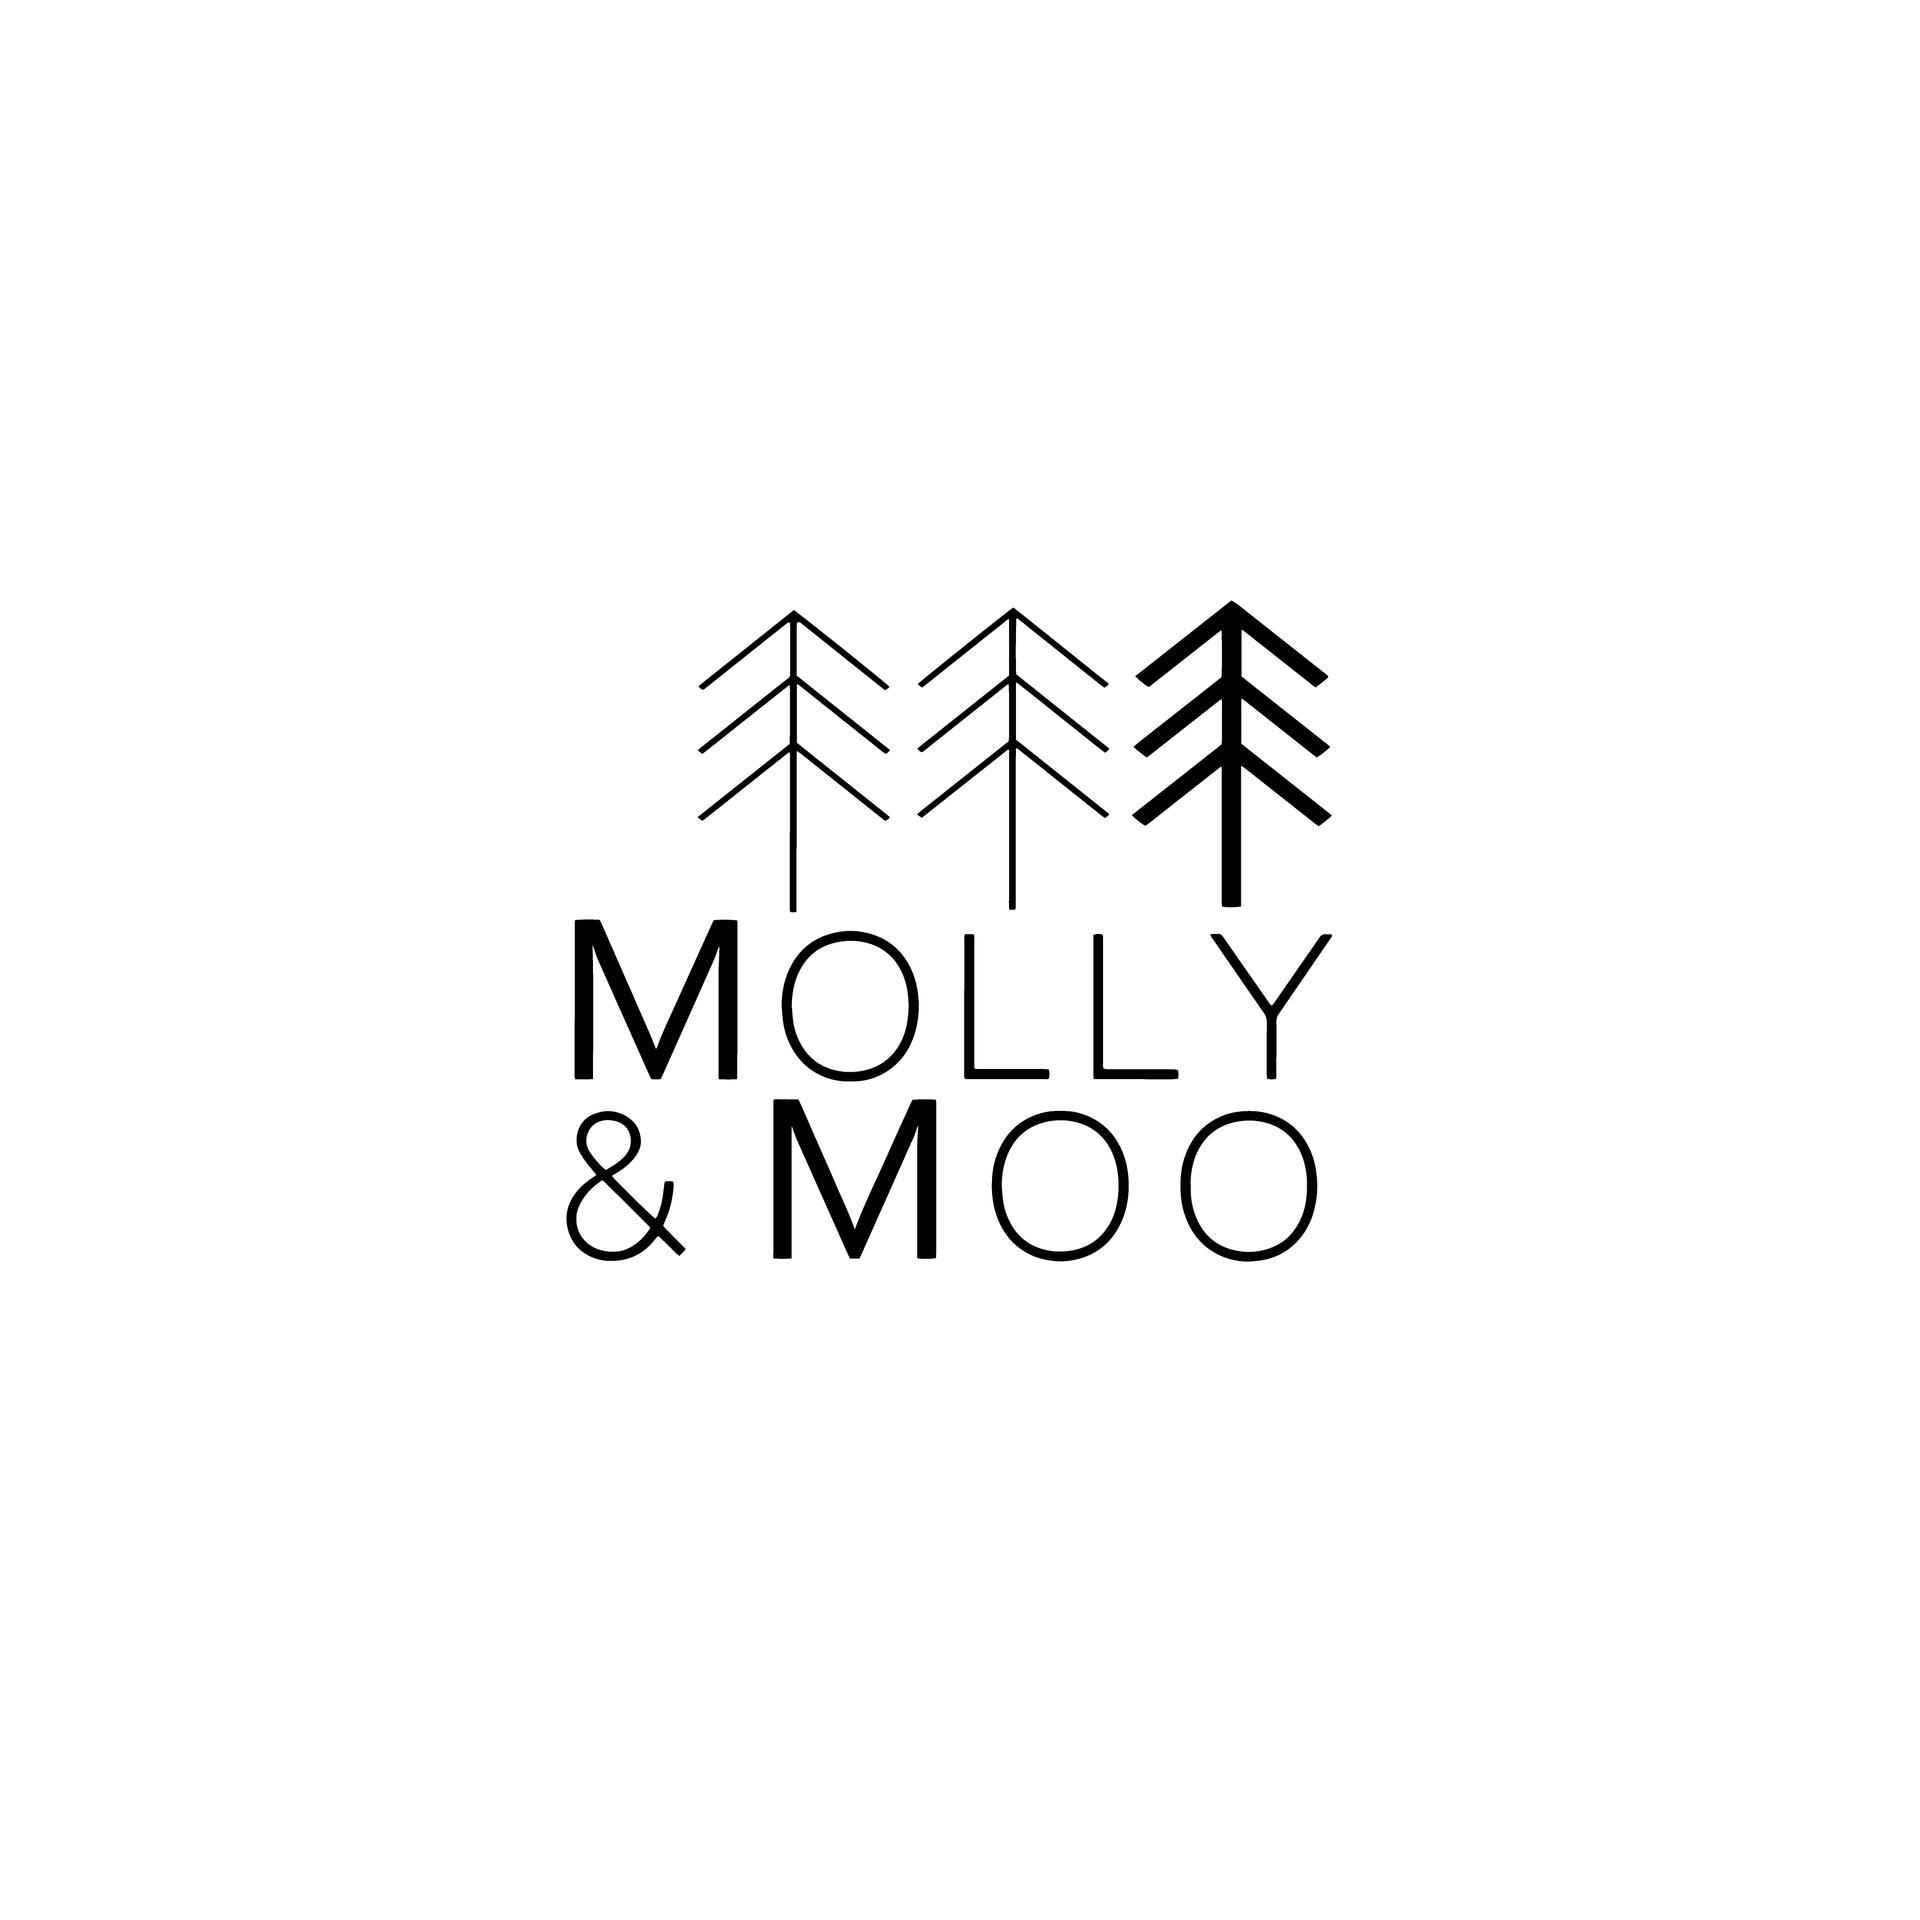 Molly & Moo Branding | Brand Identity Design by Fresh Leaf Creative